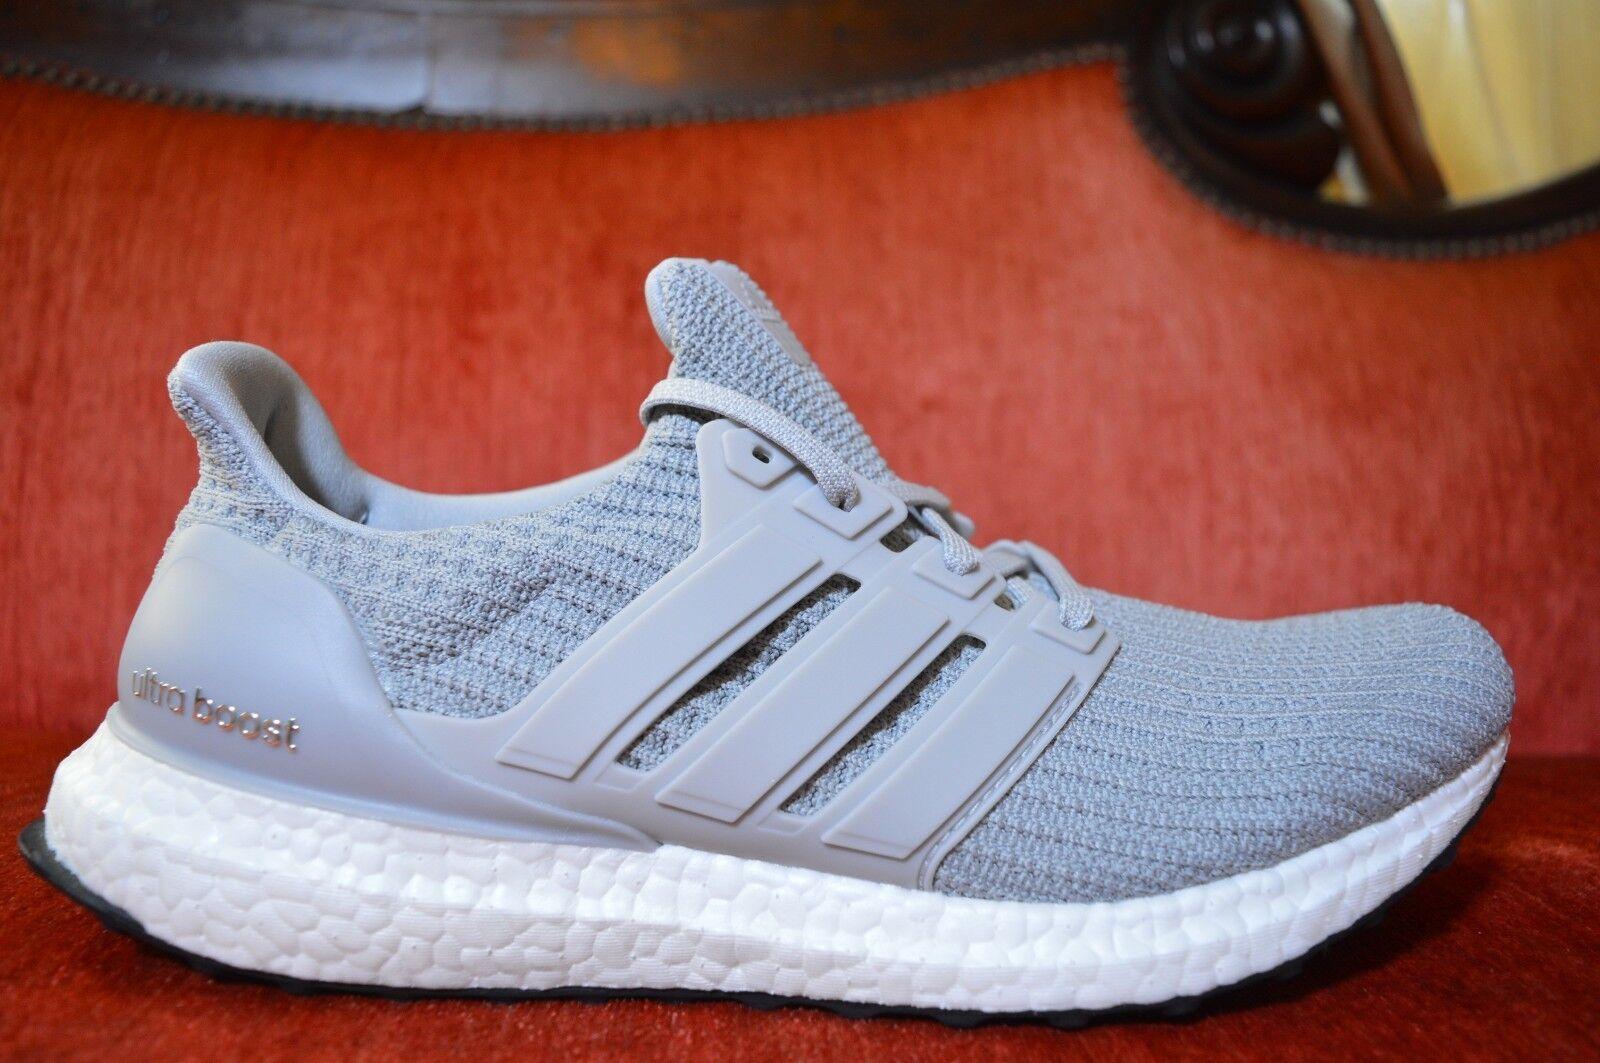 Nuove adidas ultraboost grigio bianco 41 grigio bb6167 scarpa formatori 41 bianco 8348d8